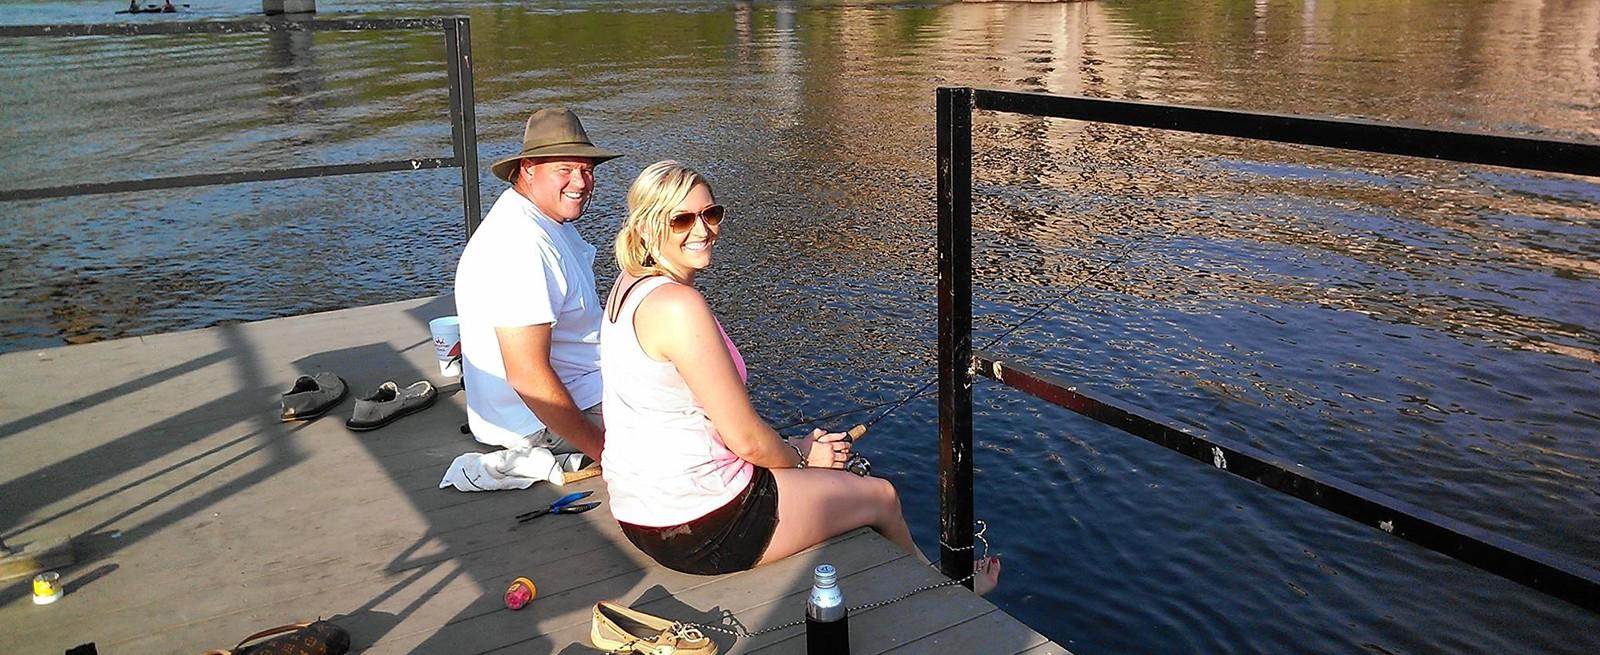 Fishing-dock-resized